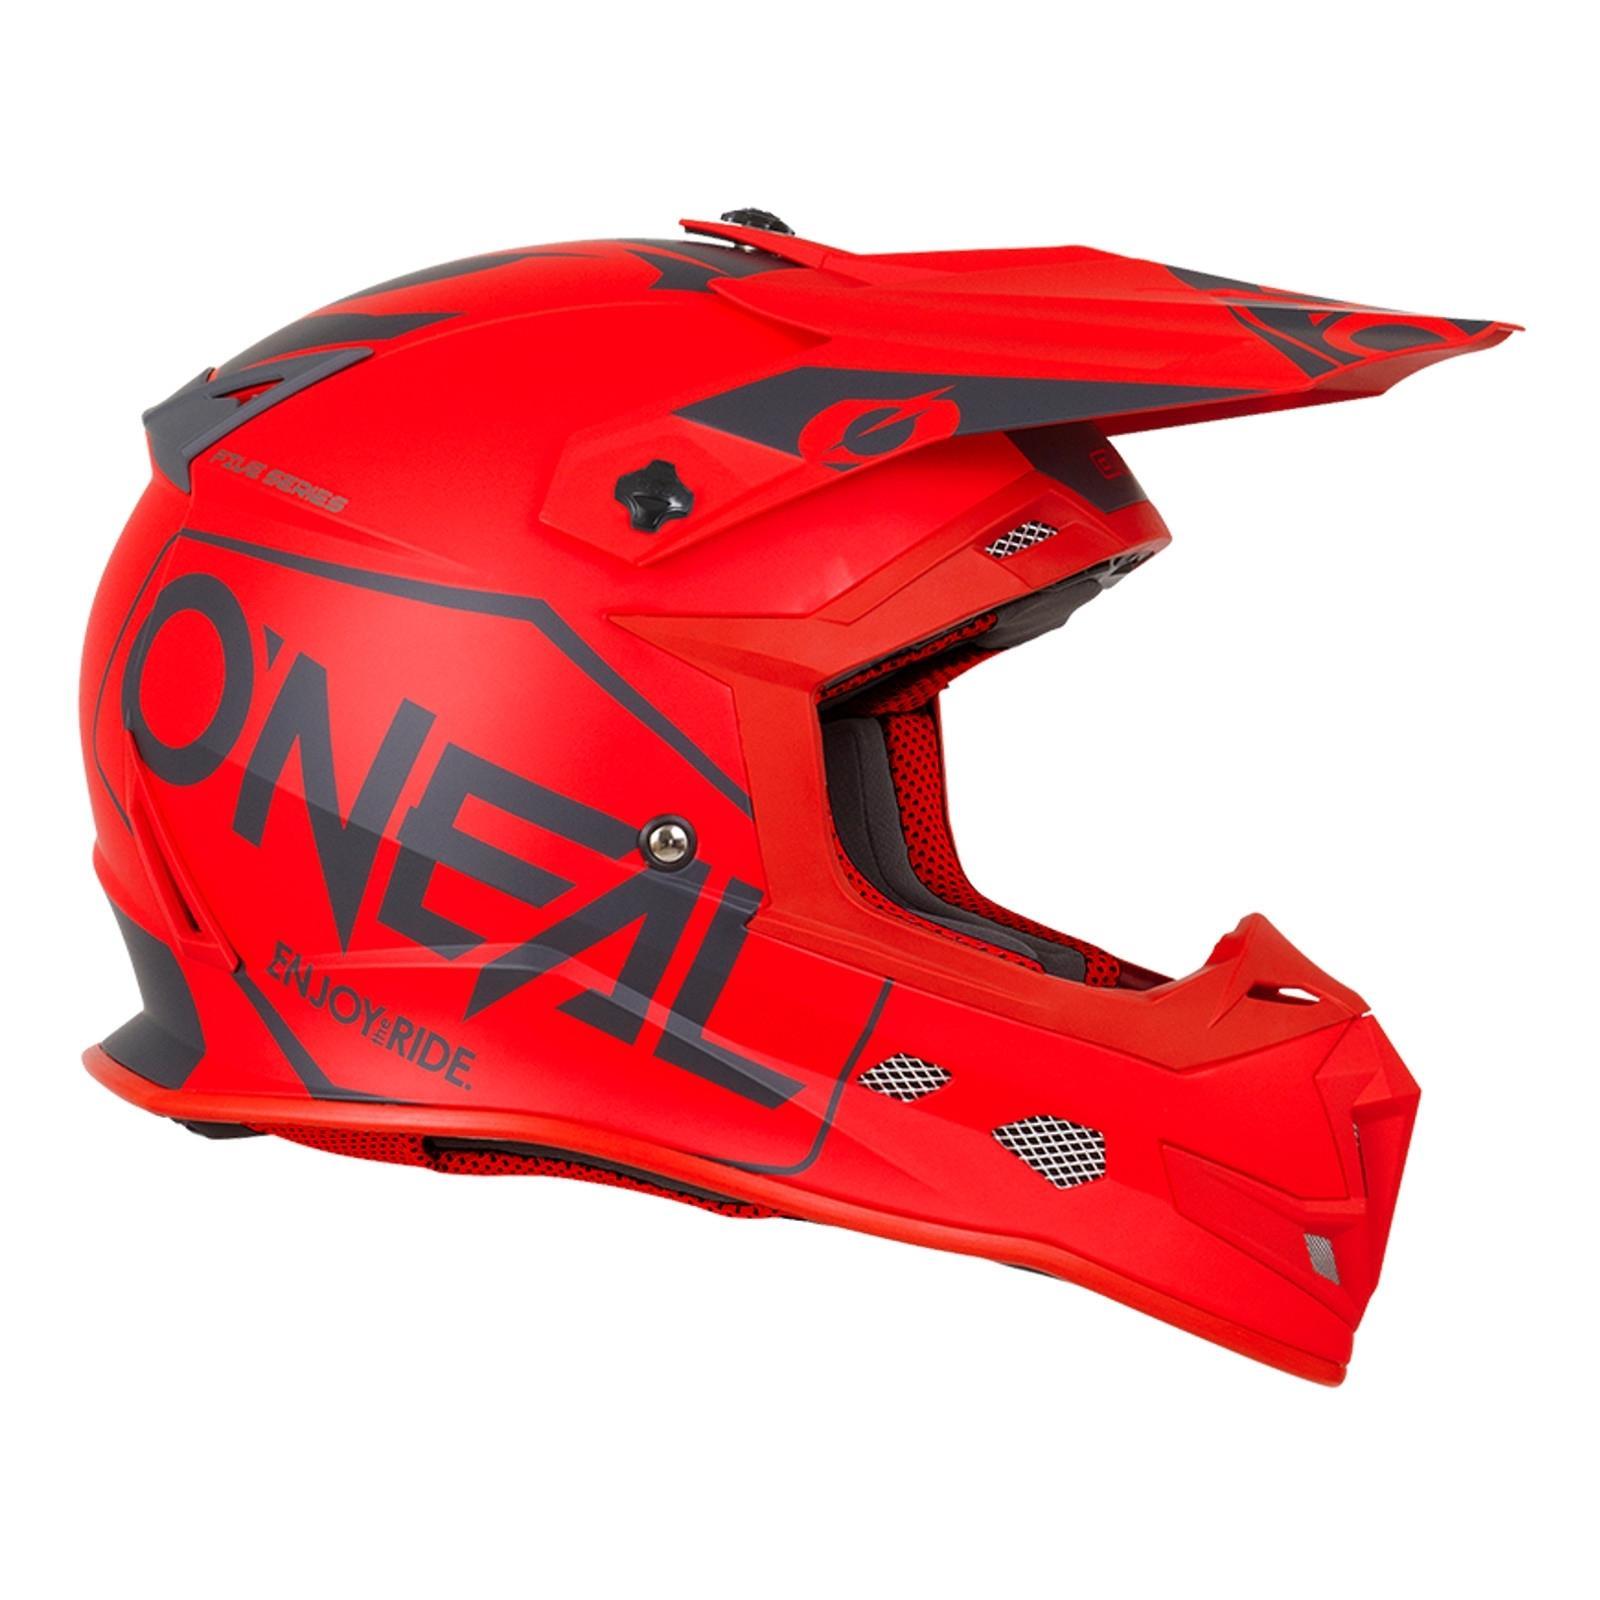 ONeal-Motocross-casco-MX-ENDURO-MOTO-BICI-FUORISTRADA-CROSS-Series-Adventure miniatura 75